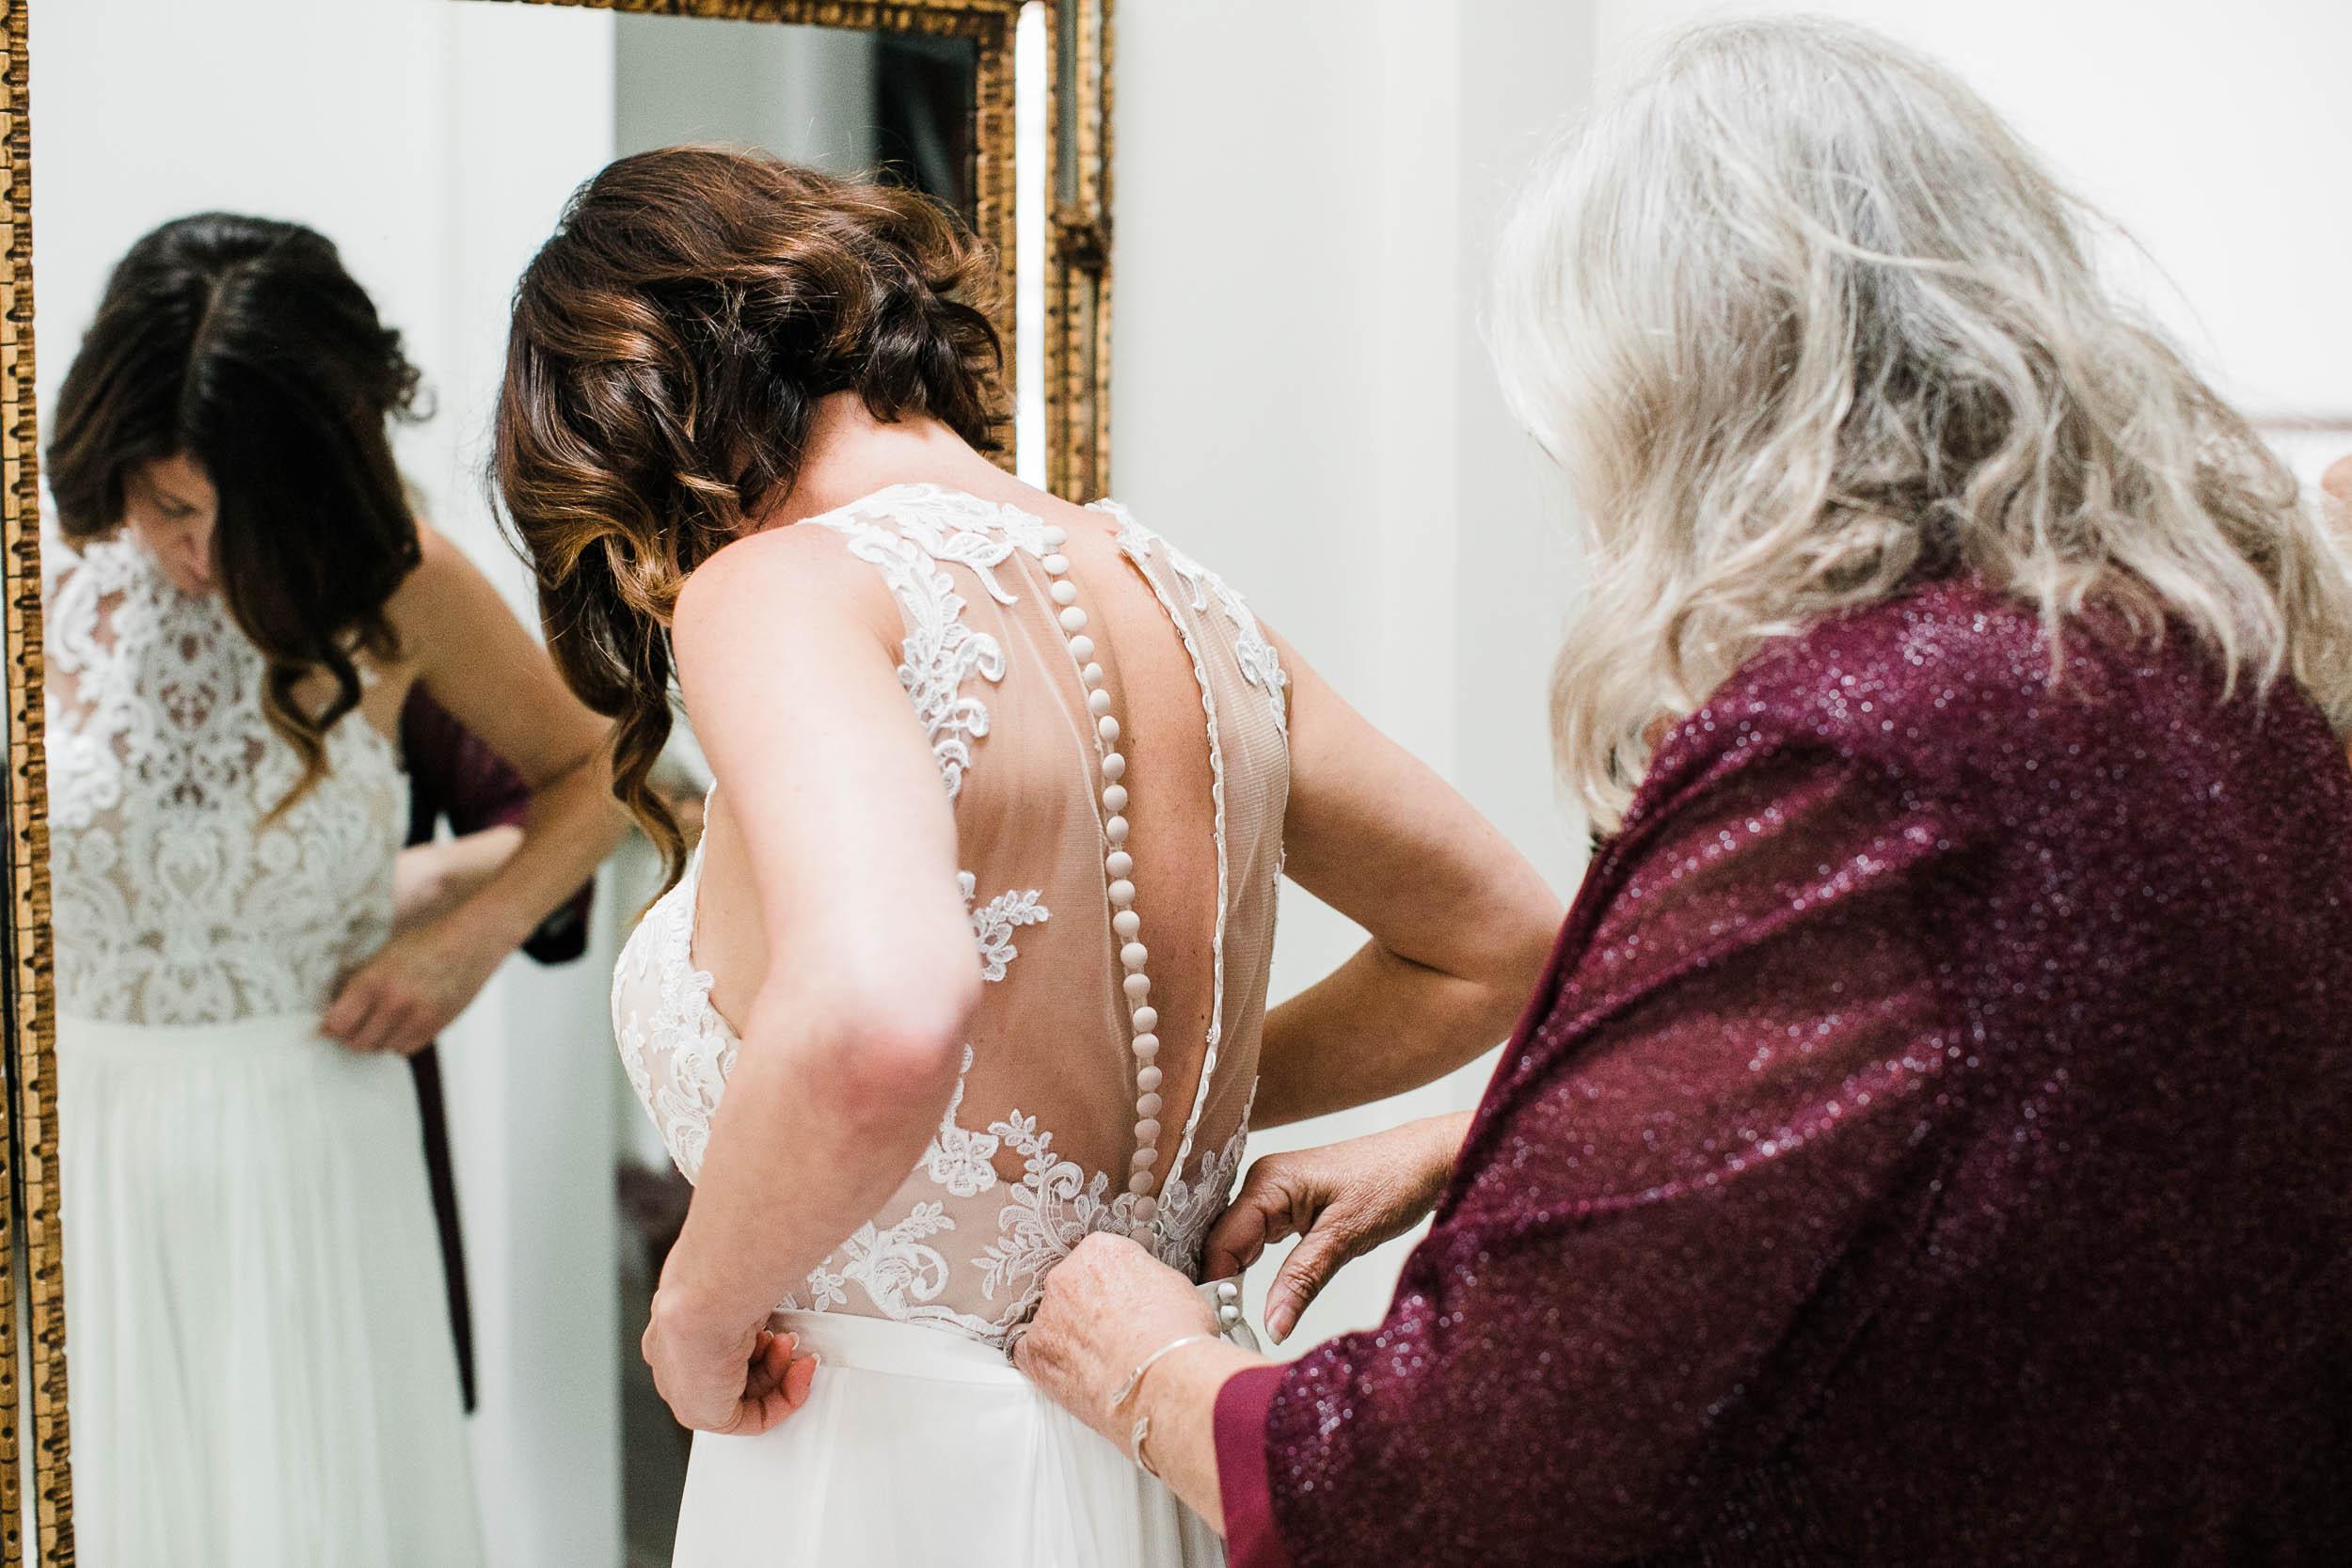 081818_Alina Jason San Francisco Wedding_Buena Lane Photography_0318 copy.jpg